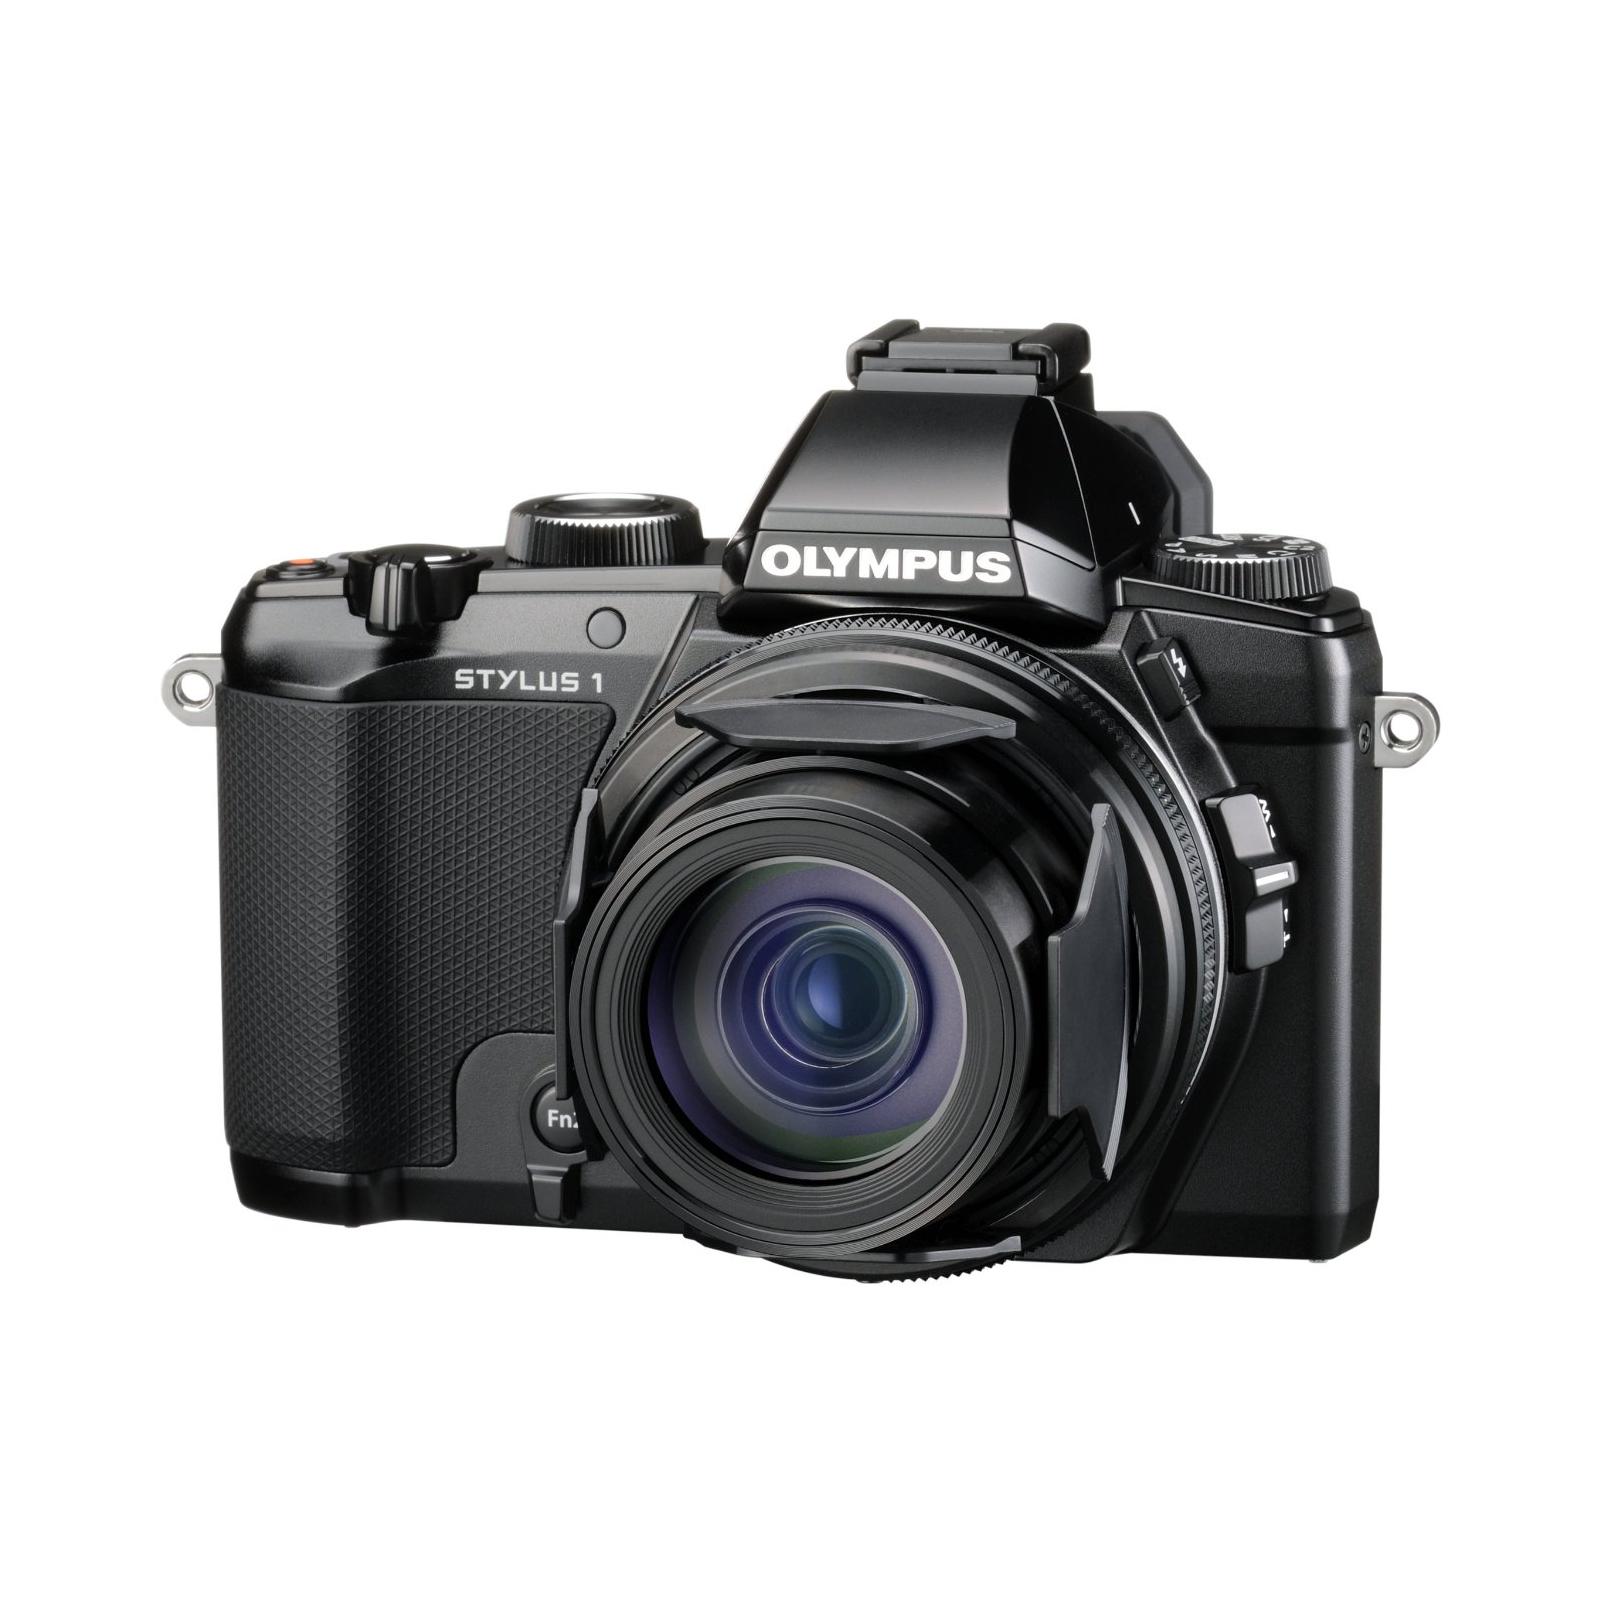 Цифровой фотоаппарат OLYMPUS STYLUS 1 Black (V109010BE000) изображение 2